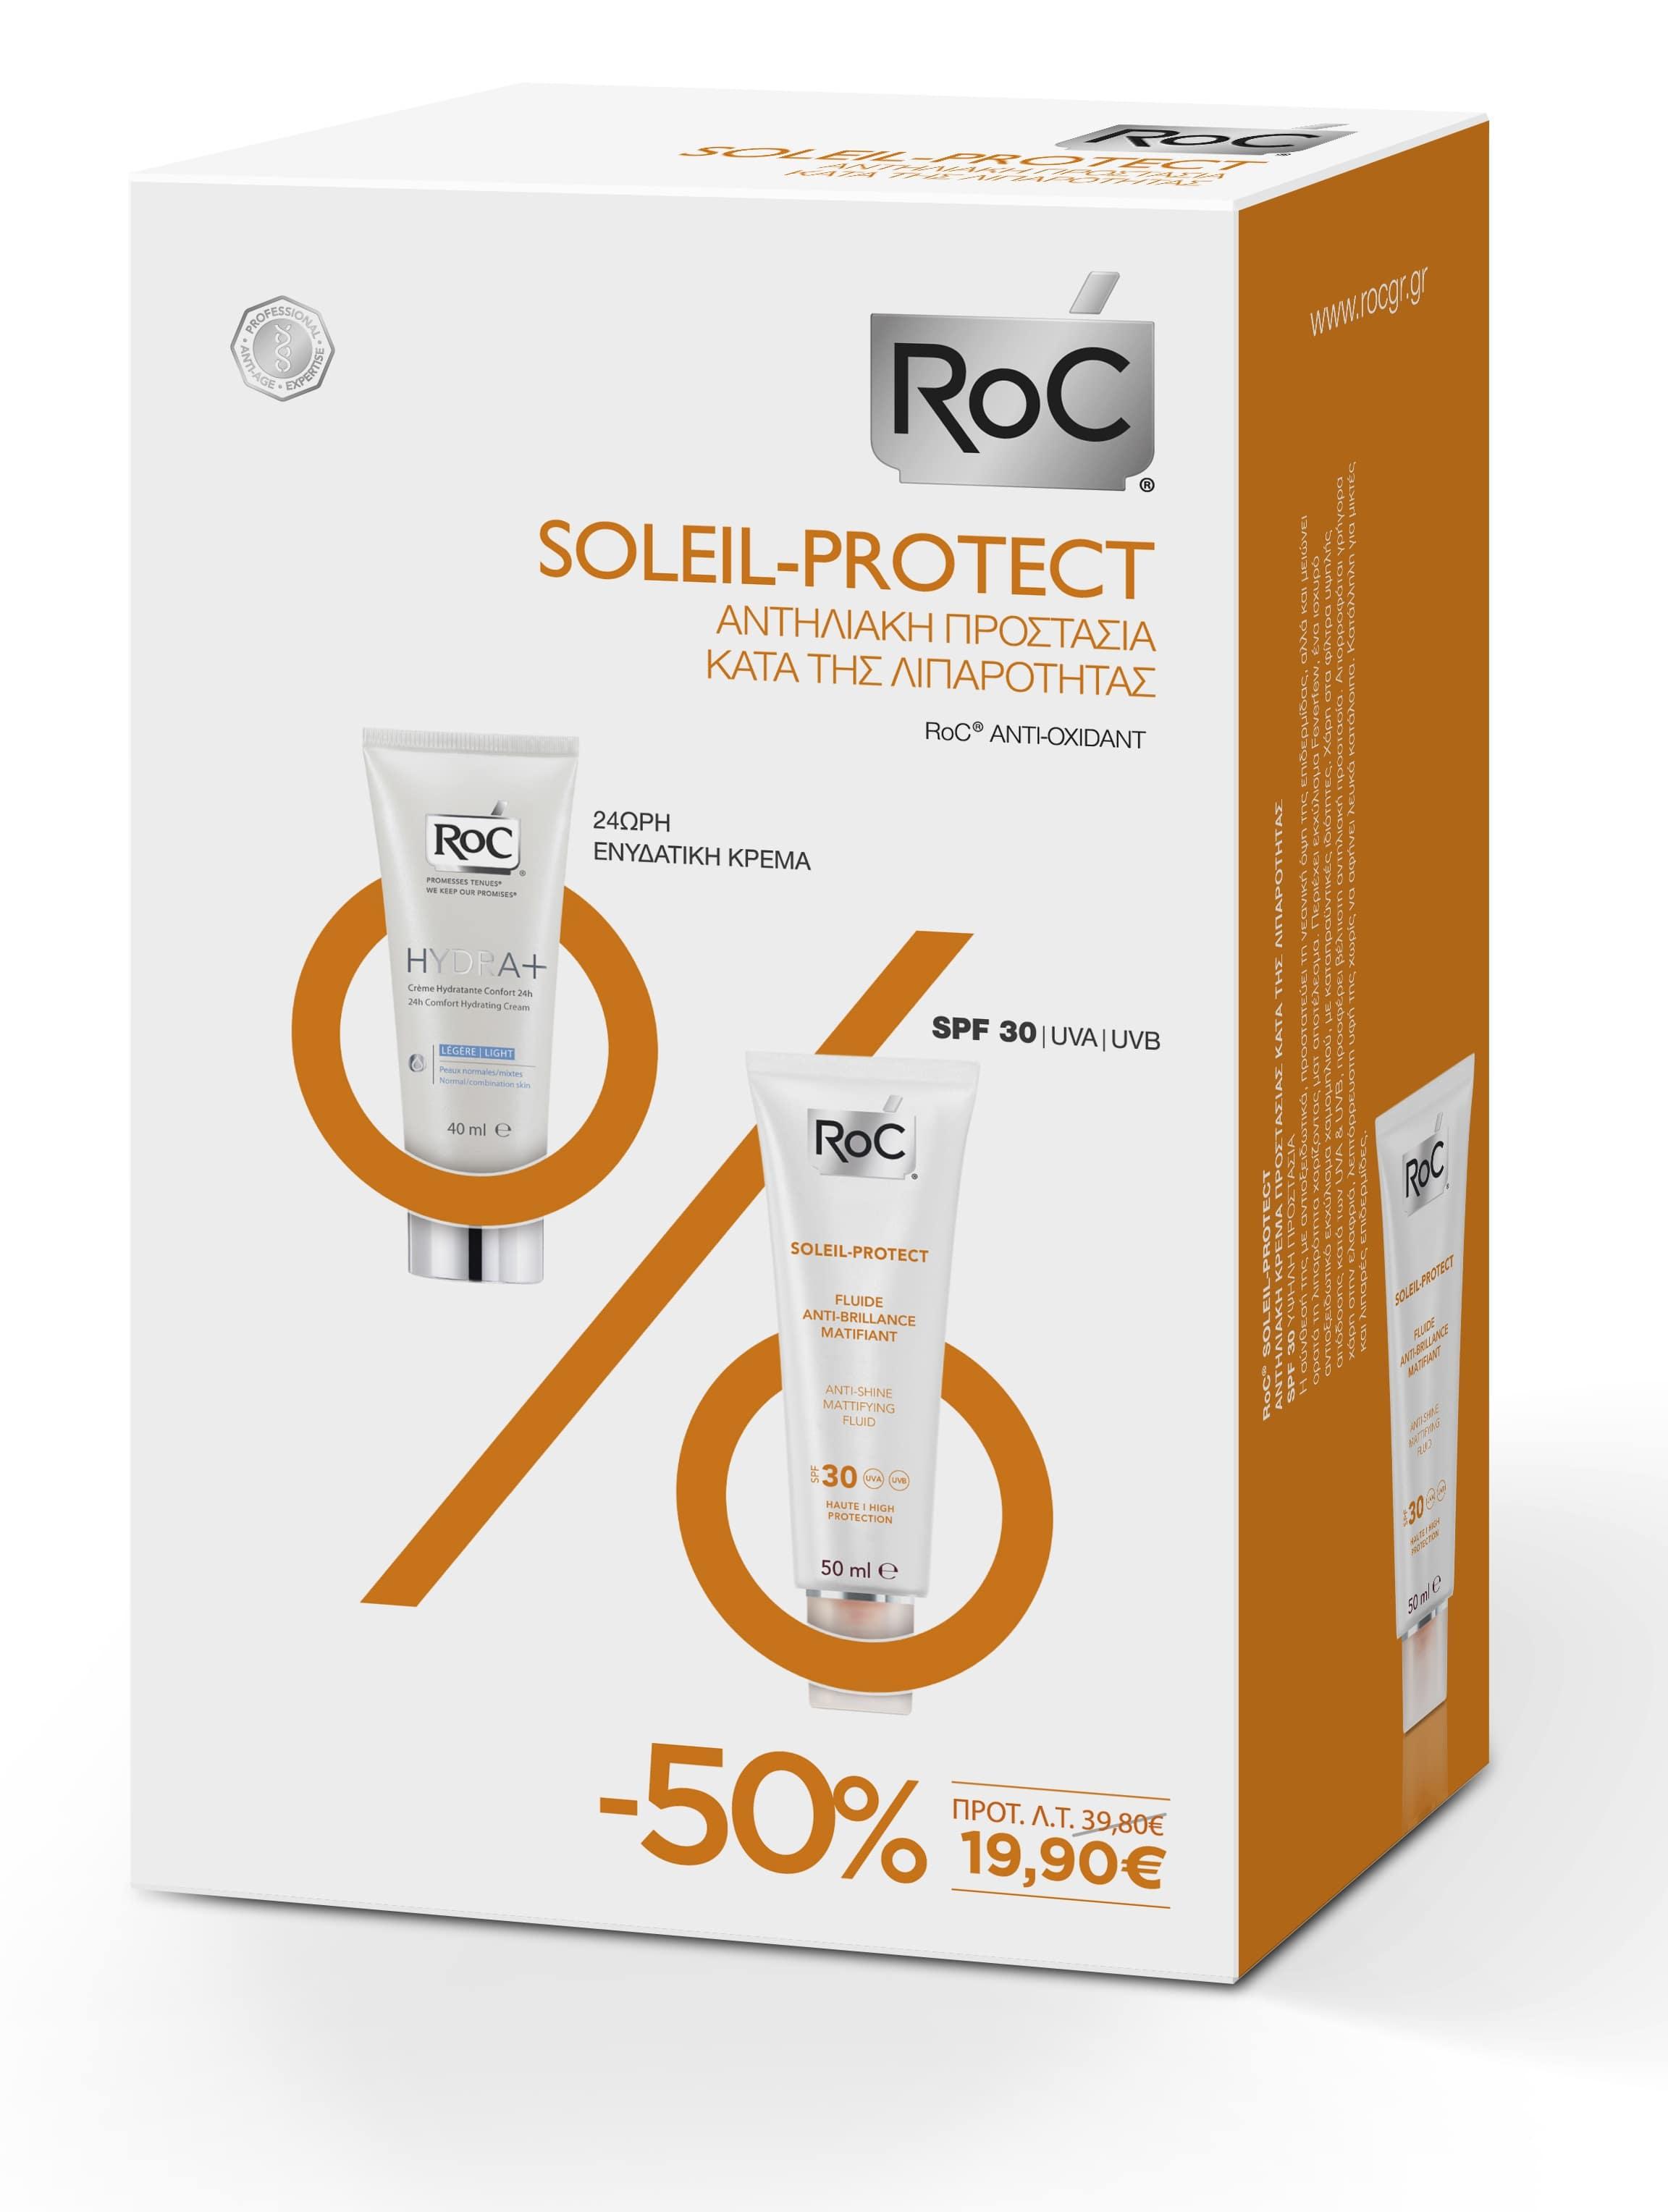 Roc Promo Pack με Soleil Protect Anti-shine Mattifying Fluid SPF30 Αντιηλιακή Κρέμα Προσώπου κατά της λιπαρότητας, 50ml & Hydra+ Legere 24ωρη Ενυδατική Κρέμα Προσώπου για κανονικές & μικτές επιδερμίδες, 40ml